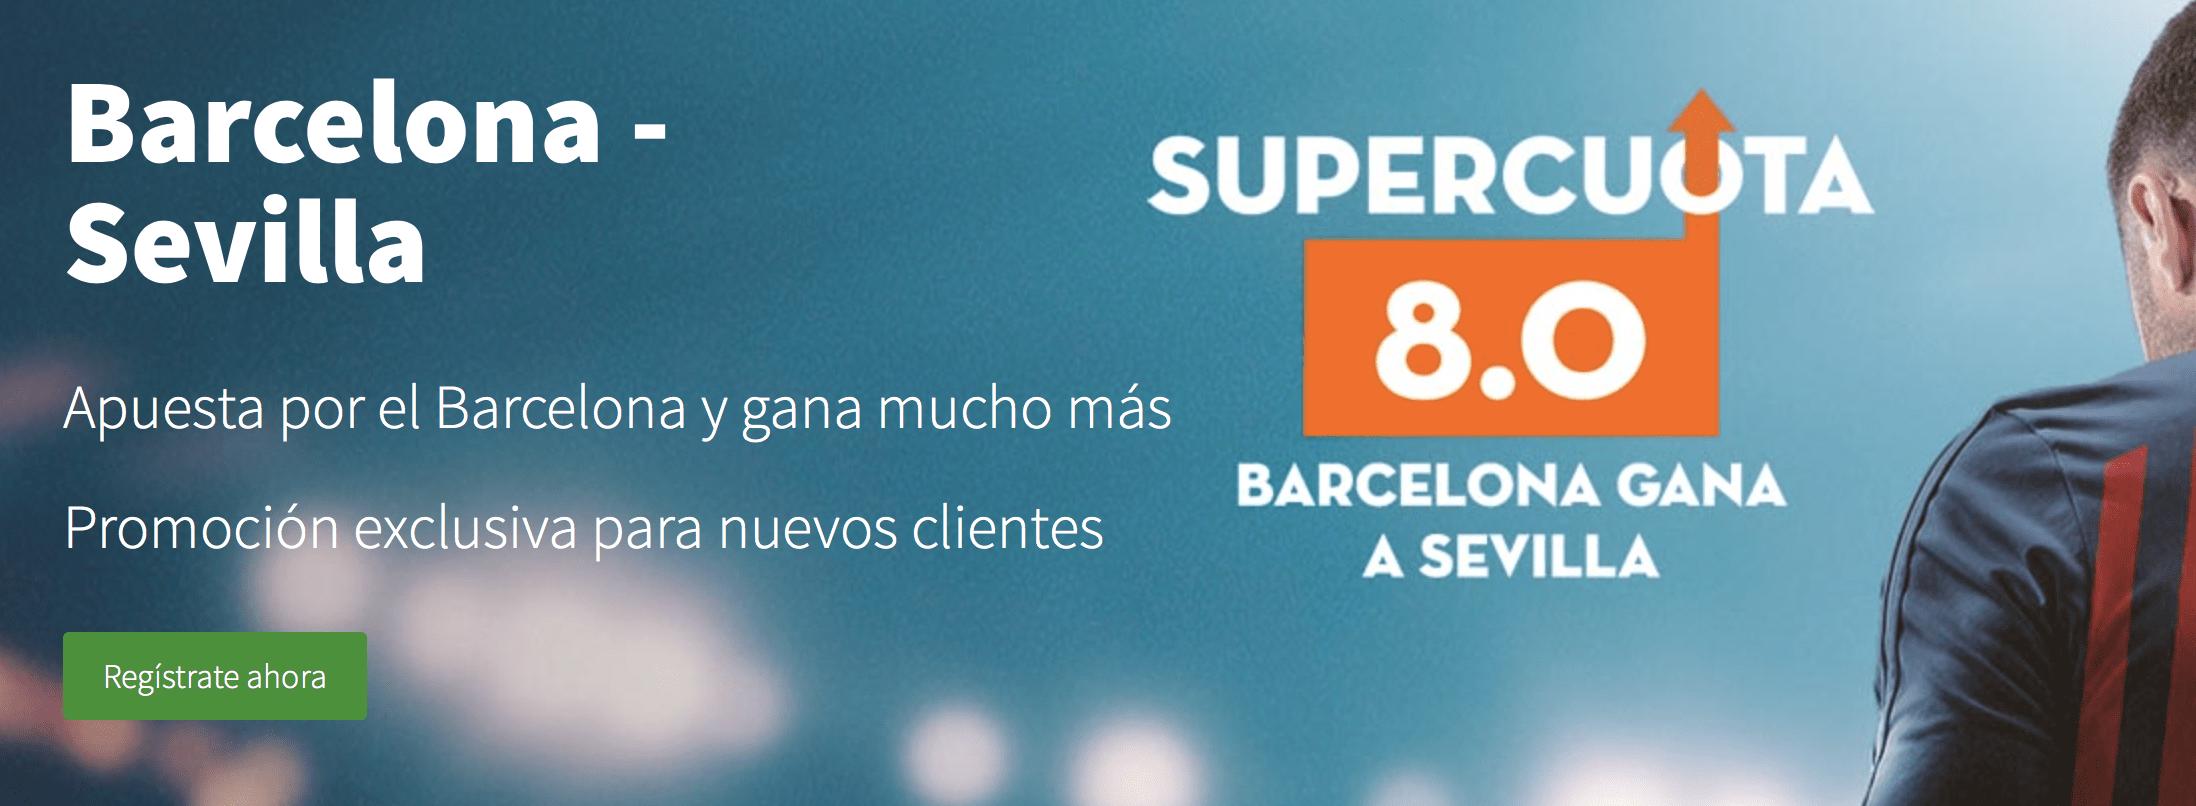 Supercuotas betsson Liga : FC Barcelona - Sevilla